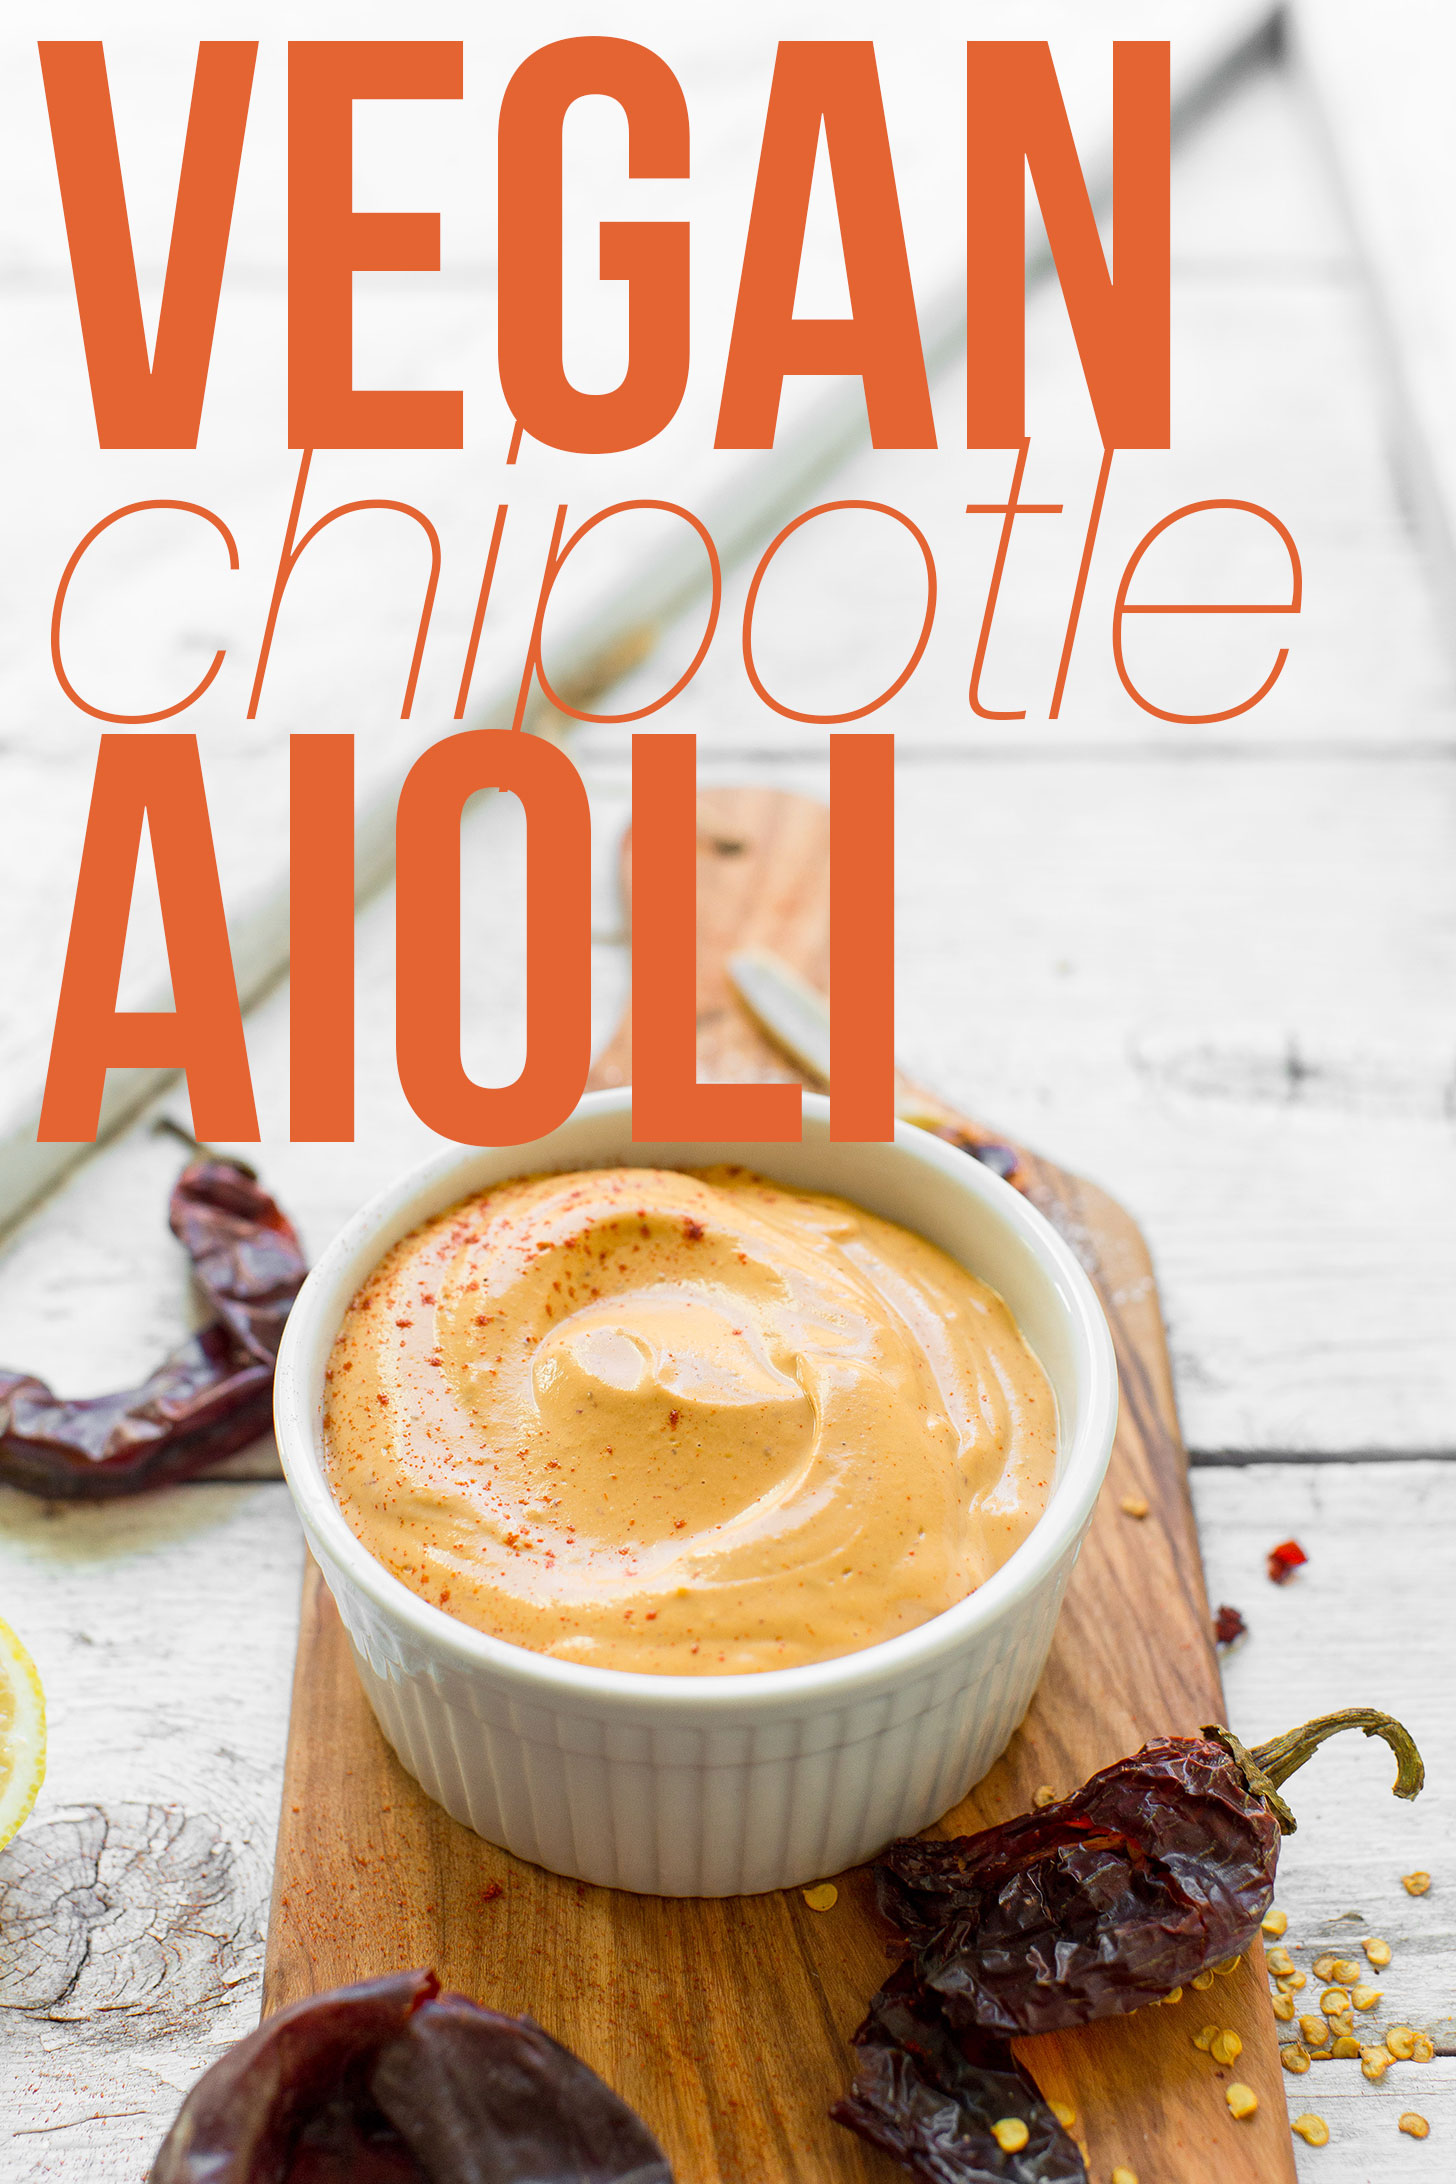 SPICY 5 Ingredient #VEGAN #Chipotle Aioli Creamy #spicy #savory perfect for dipping #vegan #glutenfree #aioli #minimalistbaker